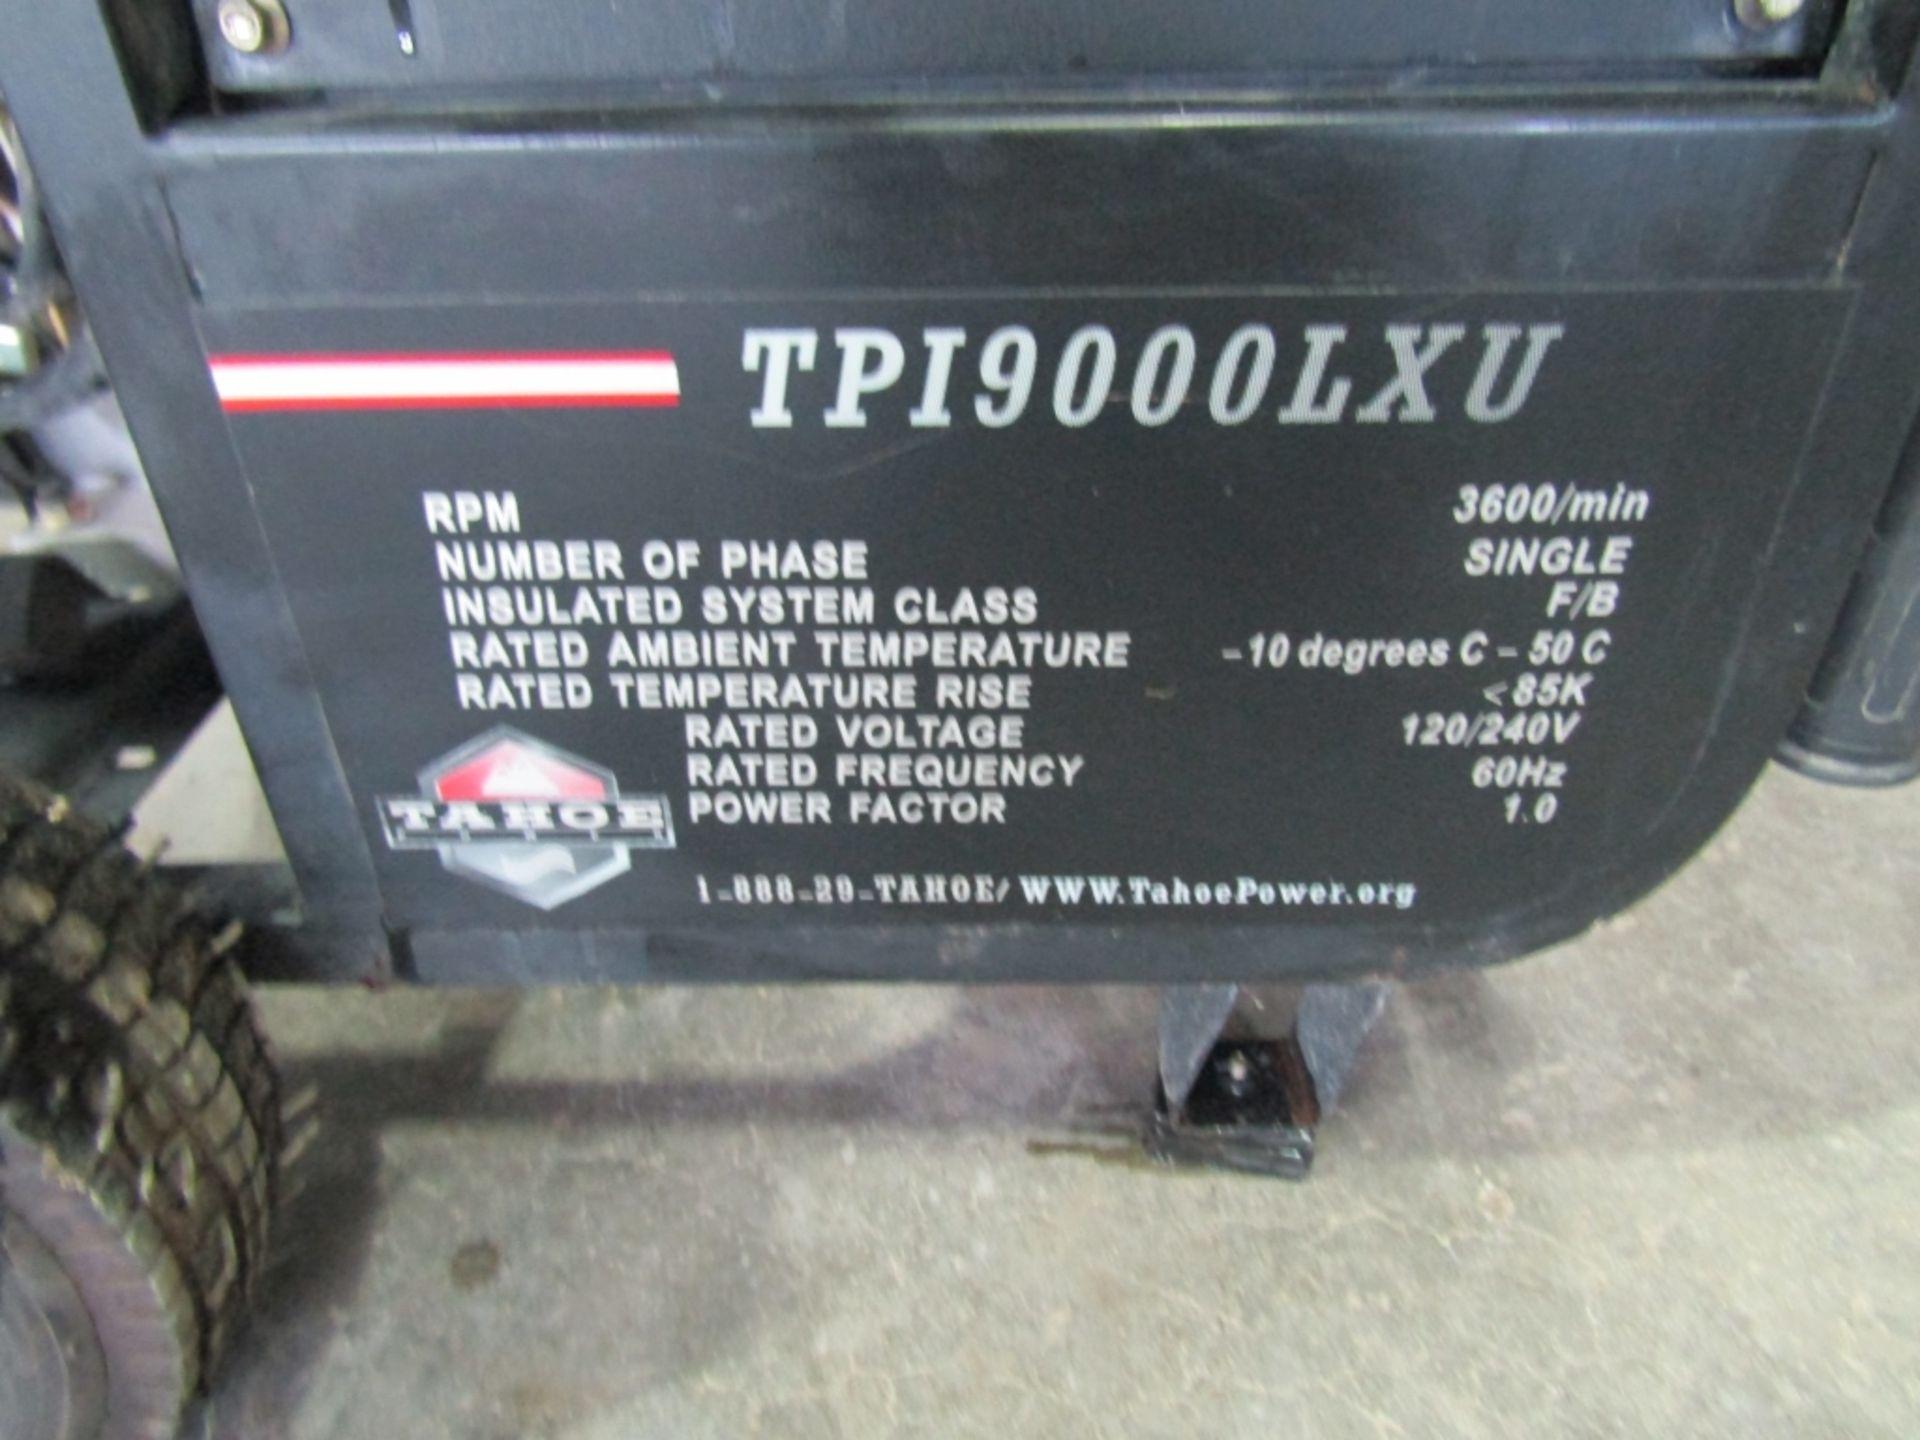 Lot 242 - TPI9000LXU Generator, Tahoe Power 9000 Watt Industrial Grade Gasoline Generator, Located in